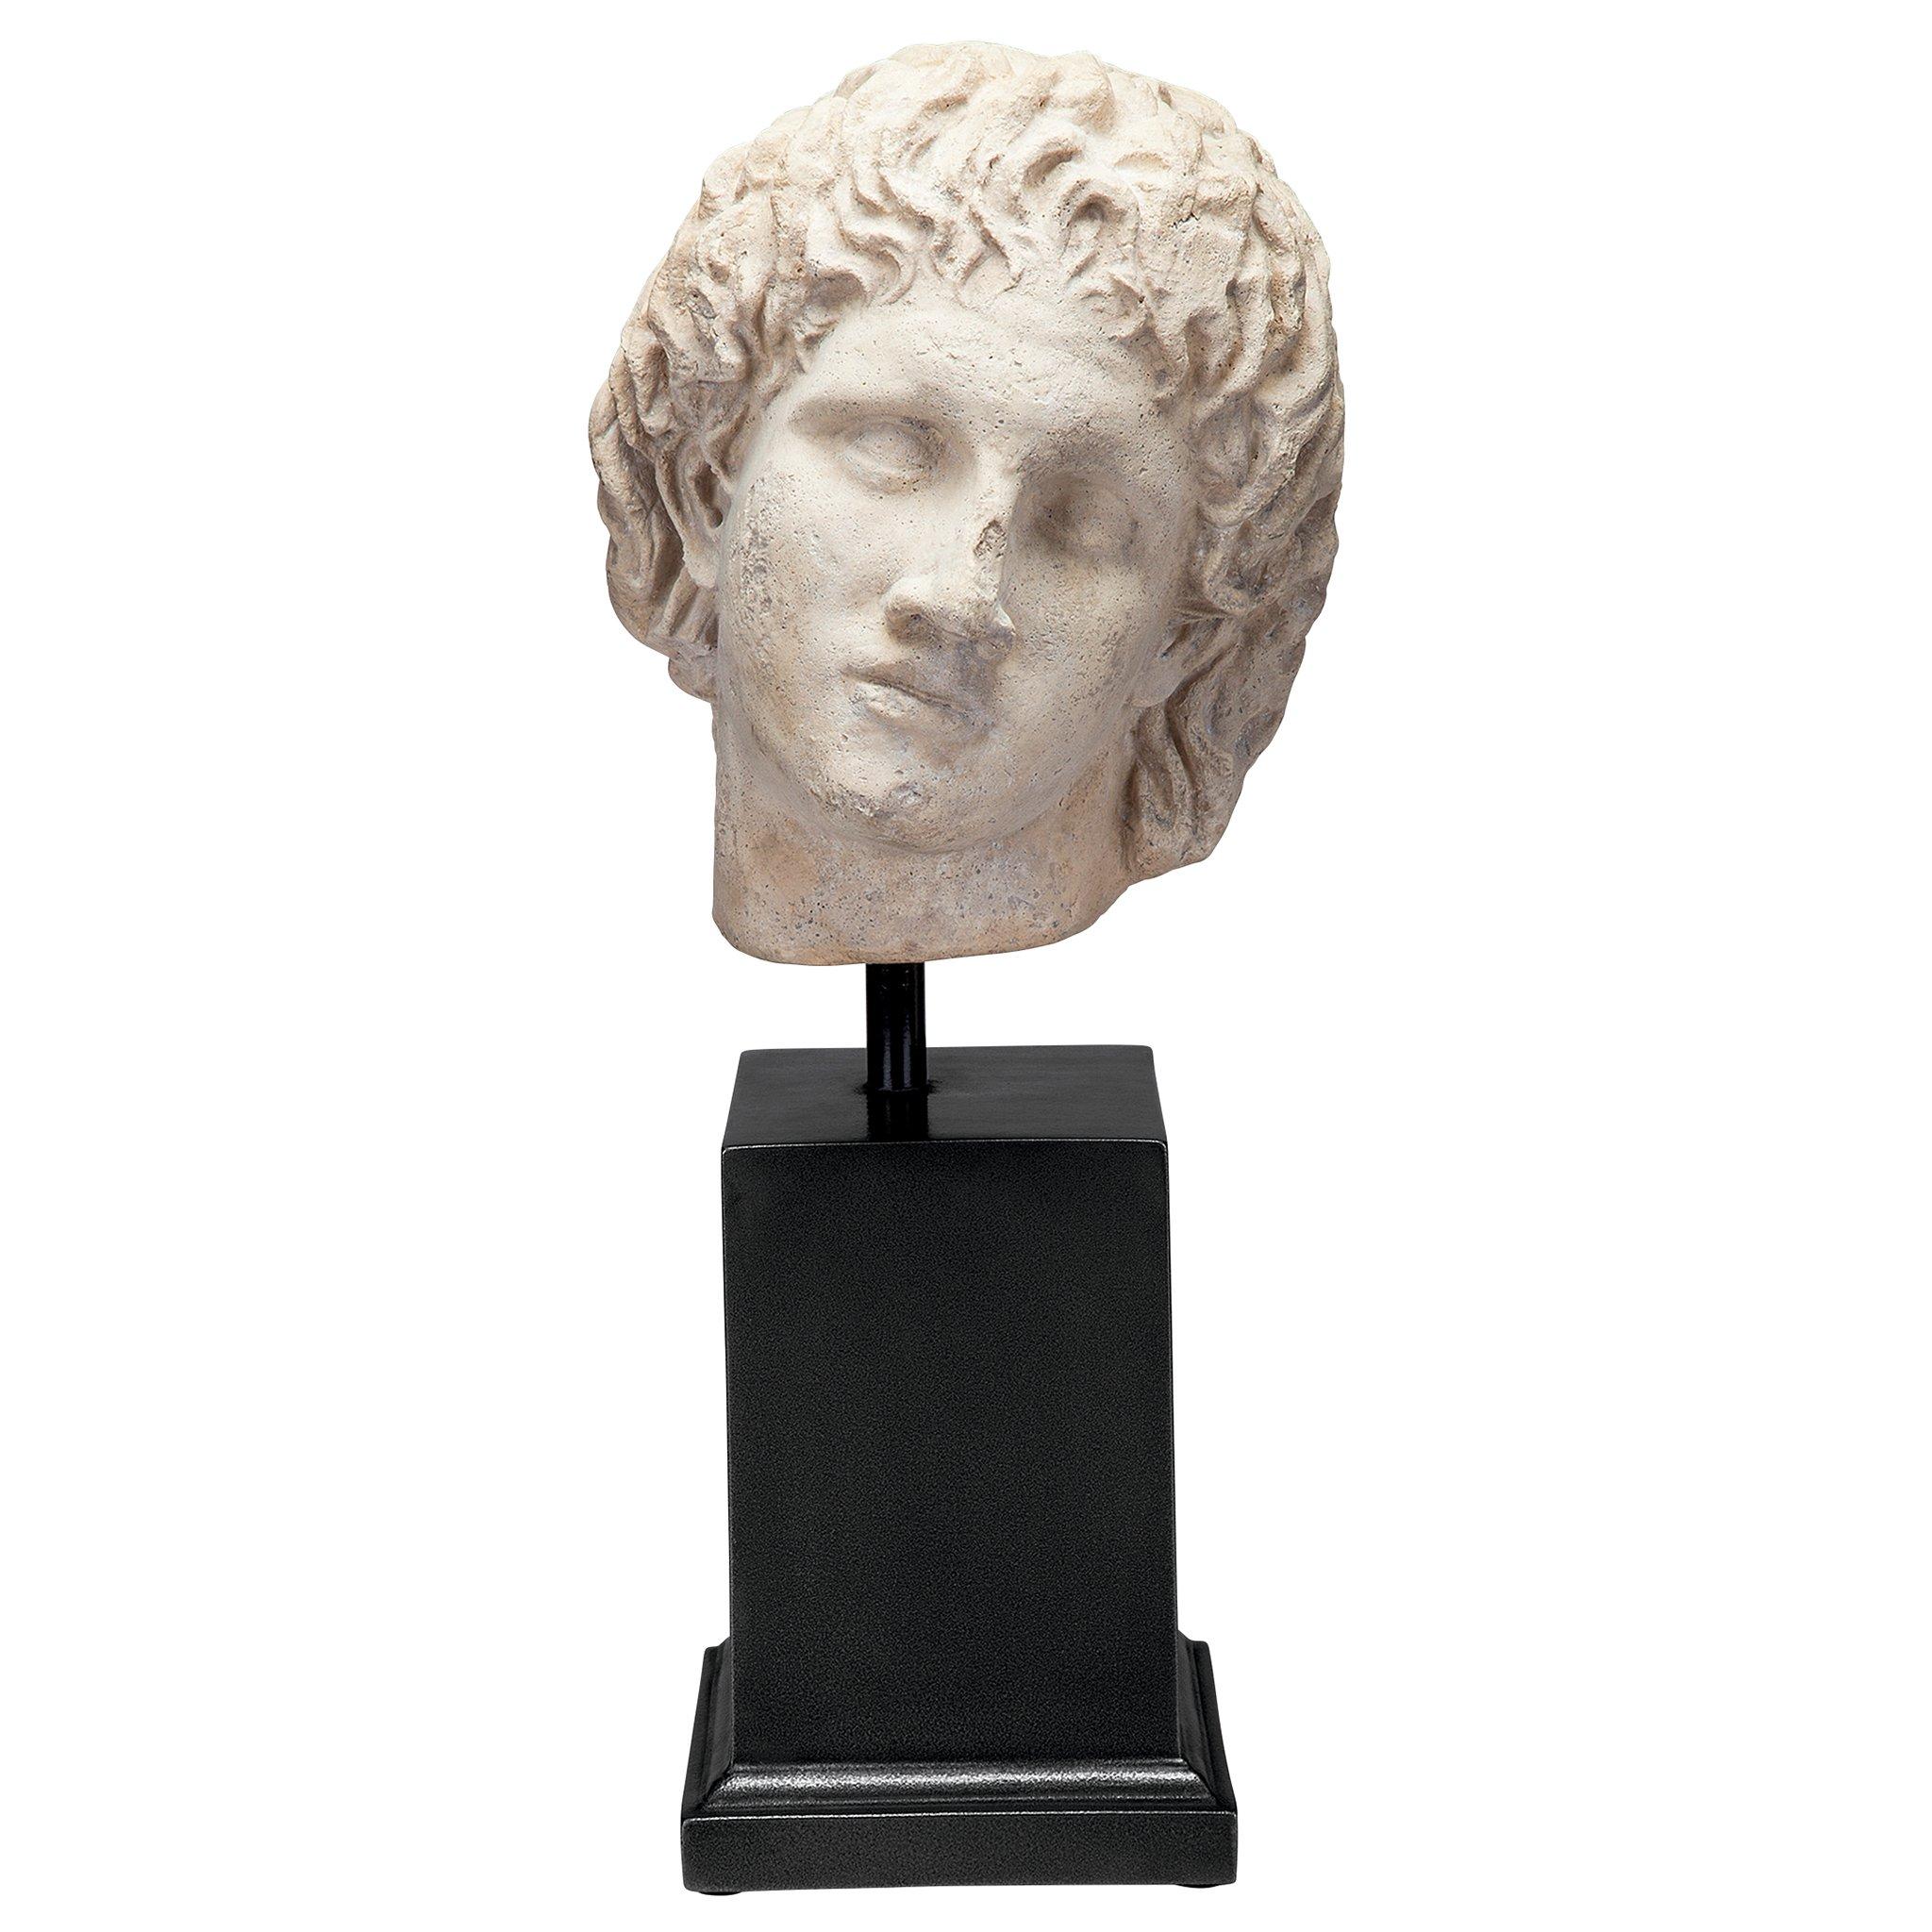 Design Toscano Alexander The Museum Mount Sculptural Bust, Antique Stone